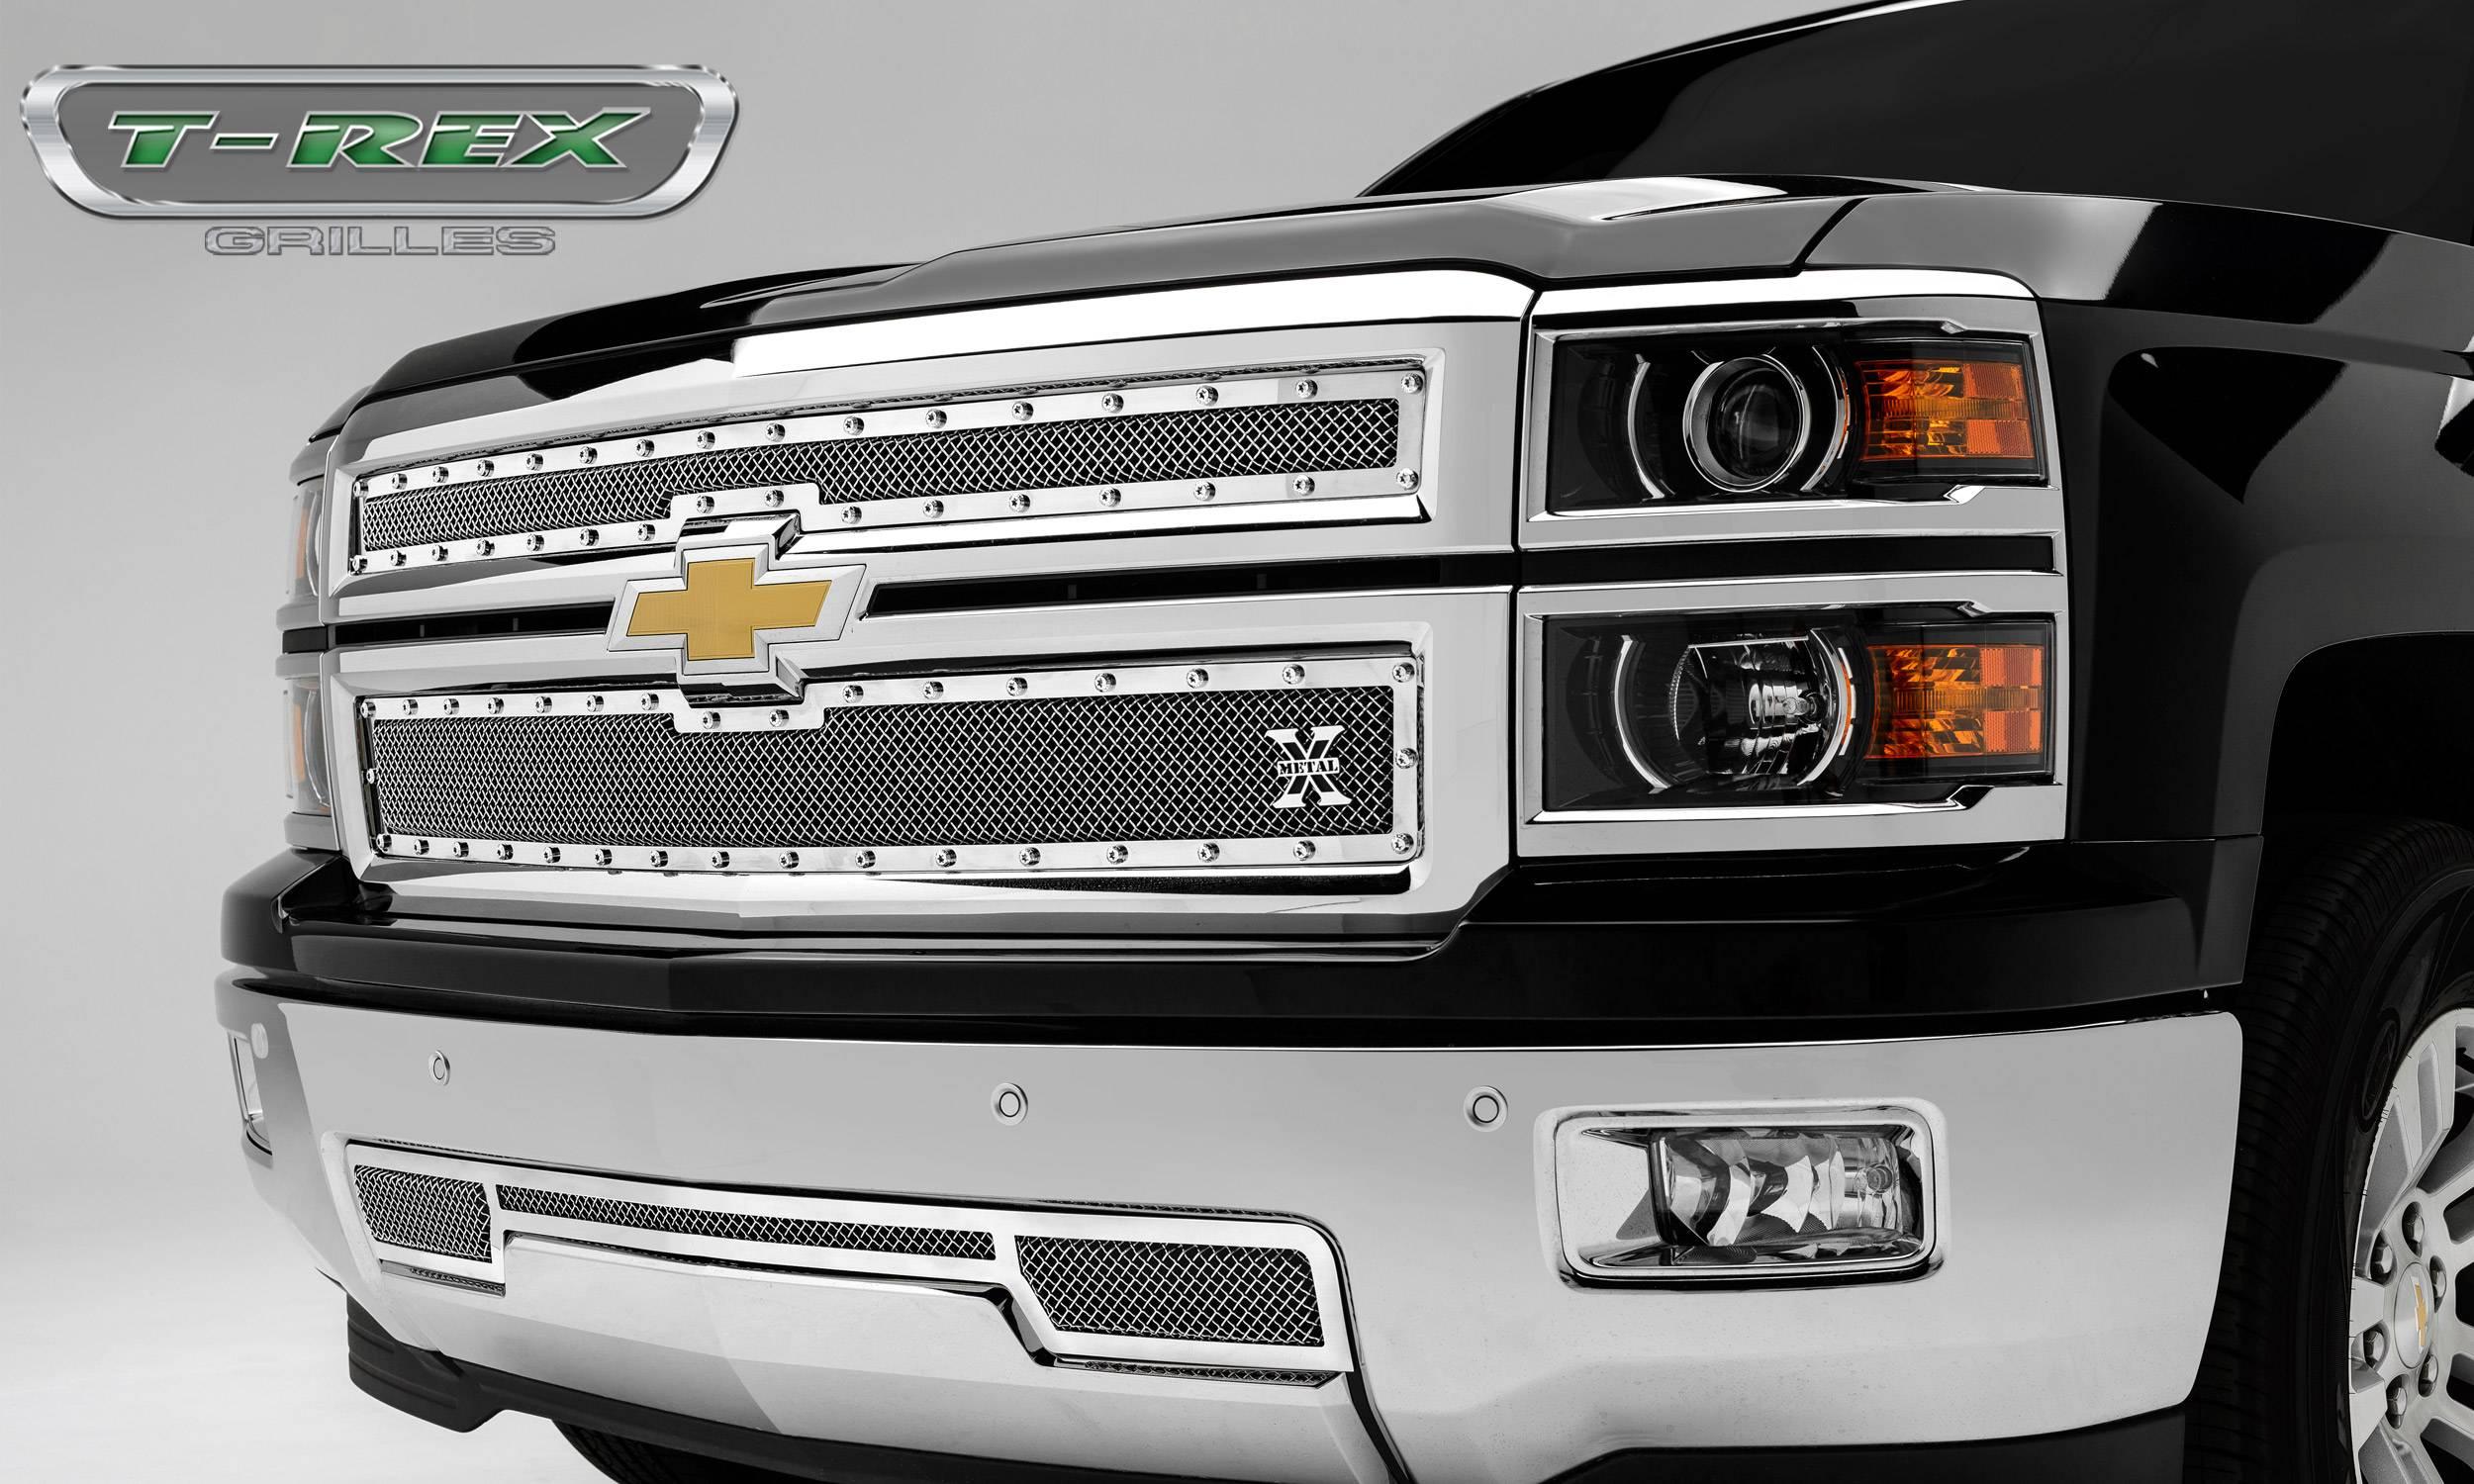 T-REX Grilles - 2014-2015 Silverado 1500 Z71 X-Metal Grille, Polished, 2 Pc, Overlay, Chrome Studs - PN #6711200